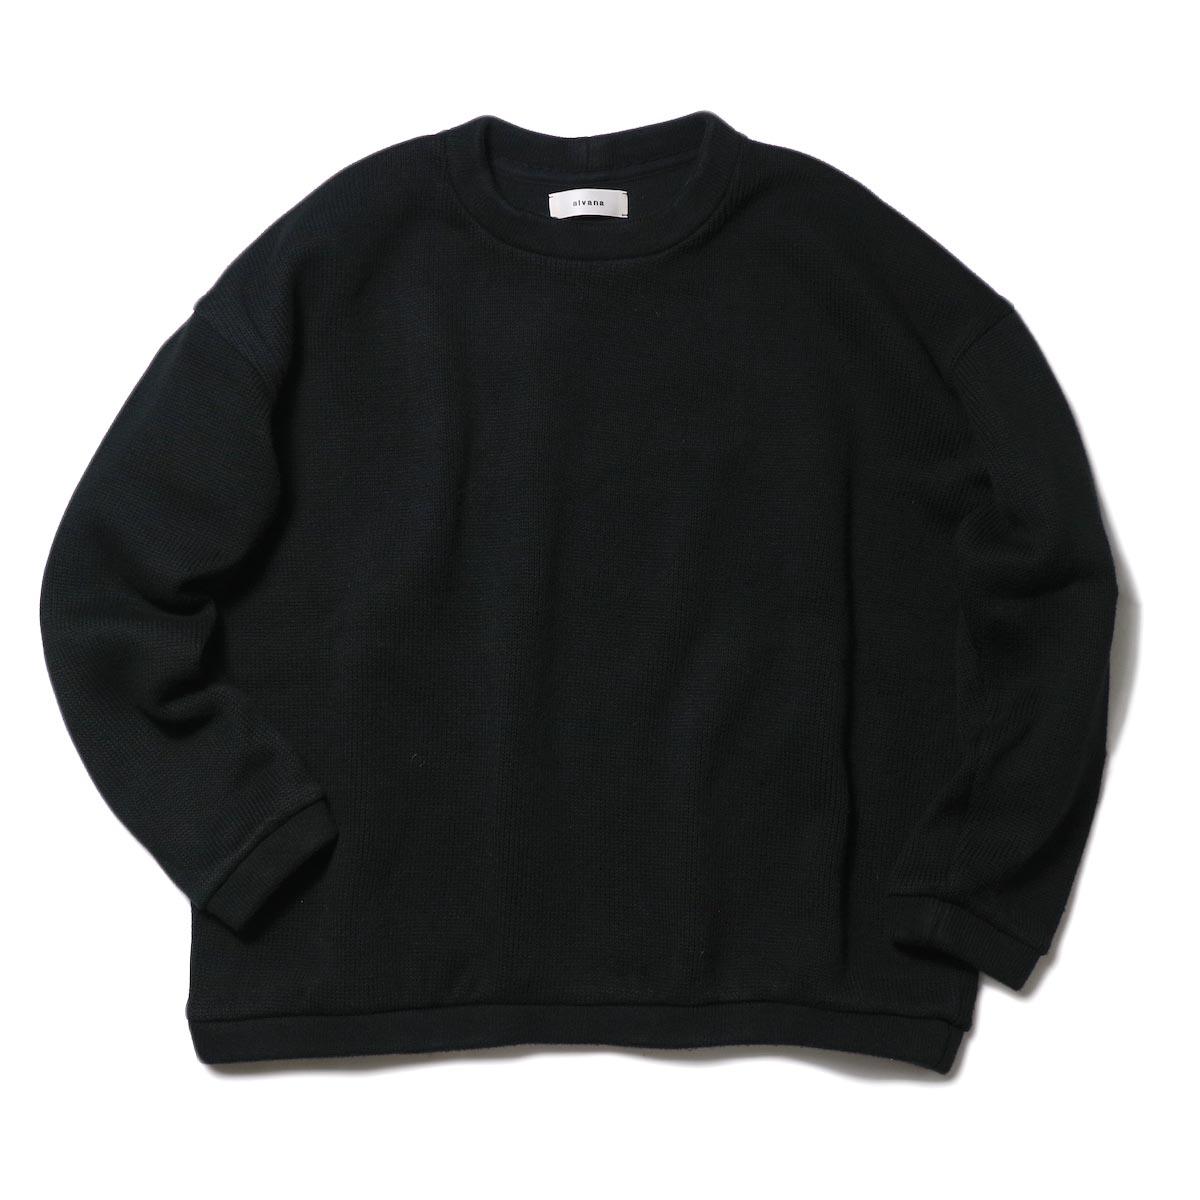 alvana / RIB KNIT CREWNECK P/O (Black)